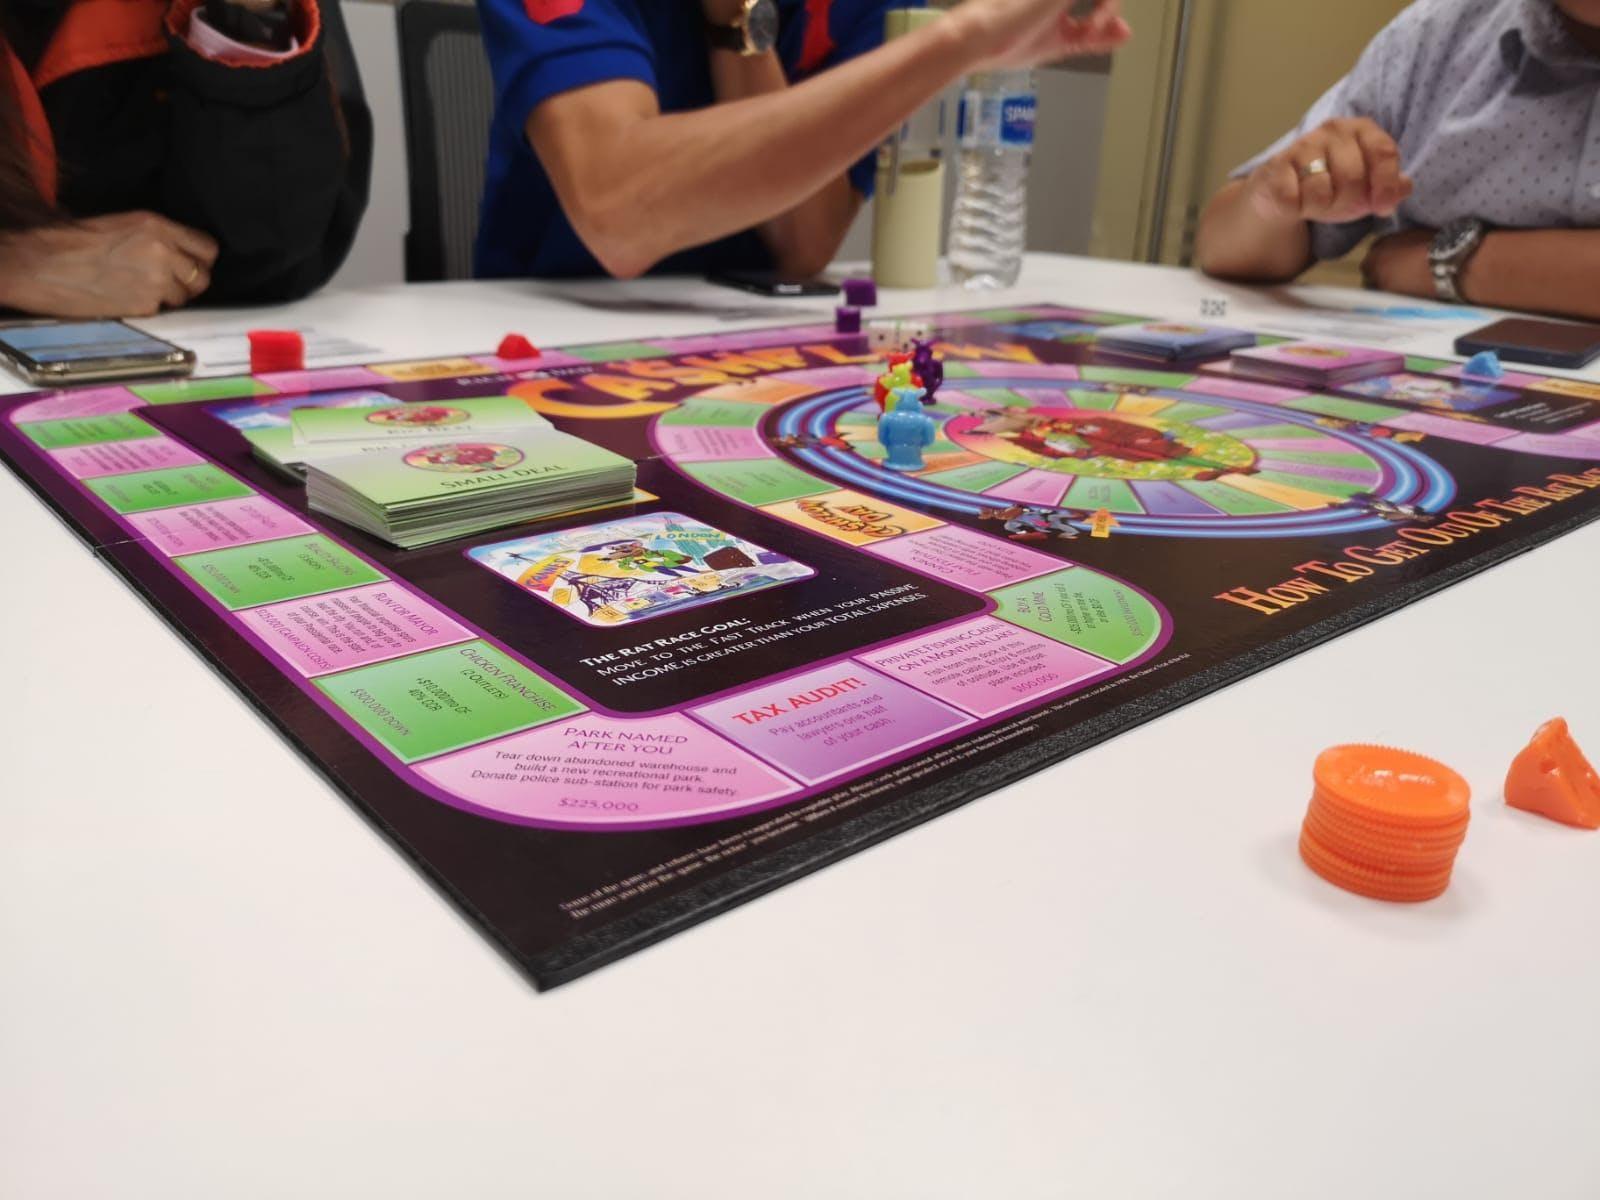 Cashflow 101 Board Game South Africa